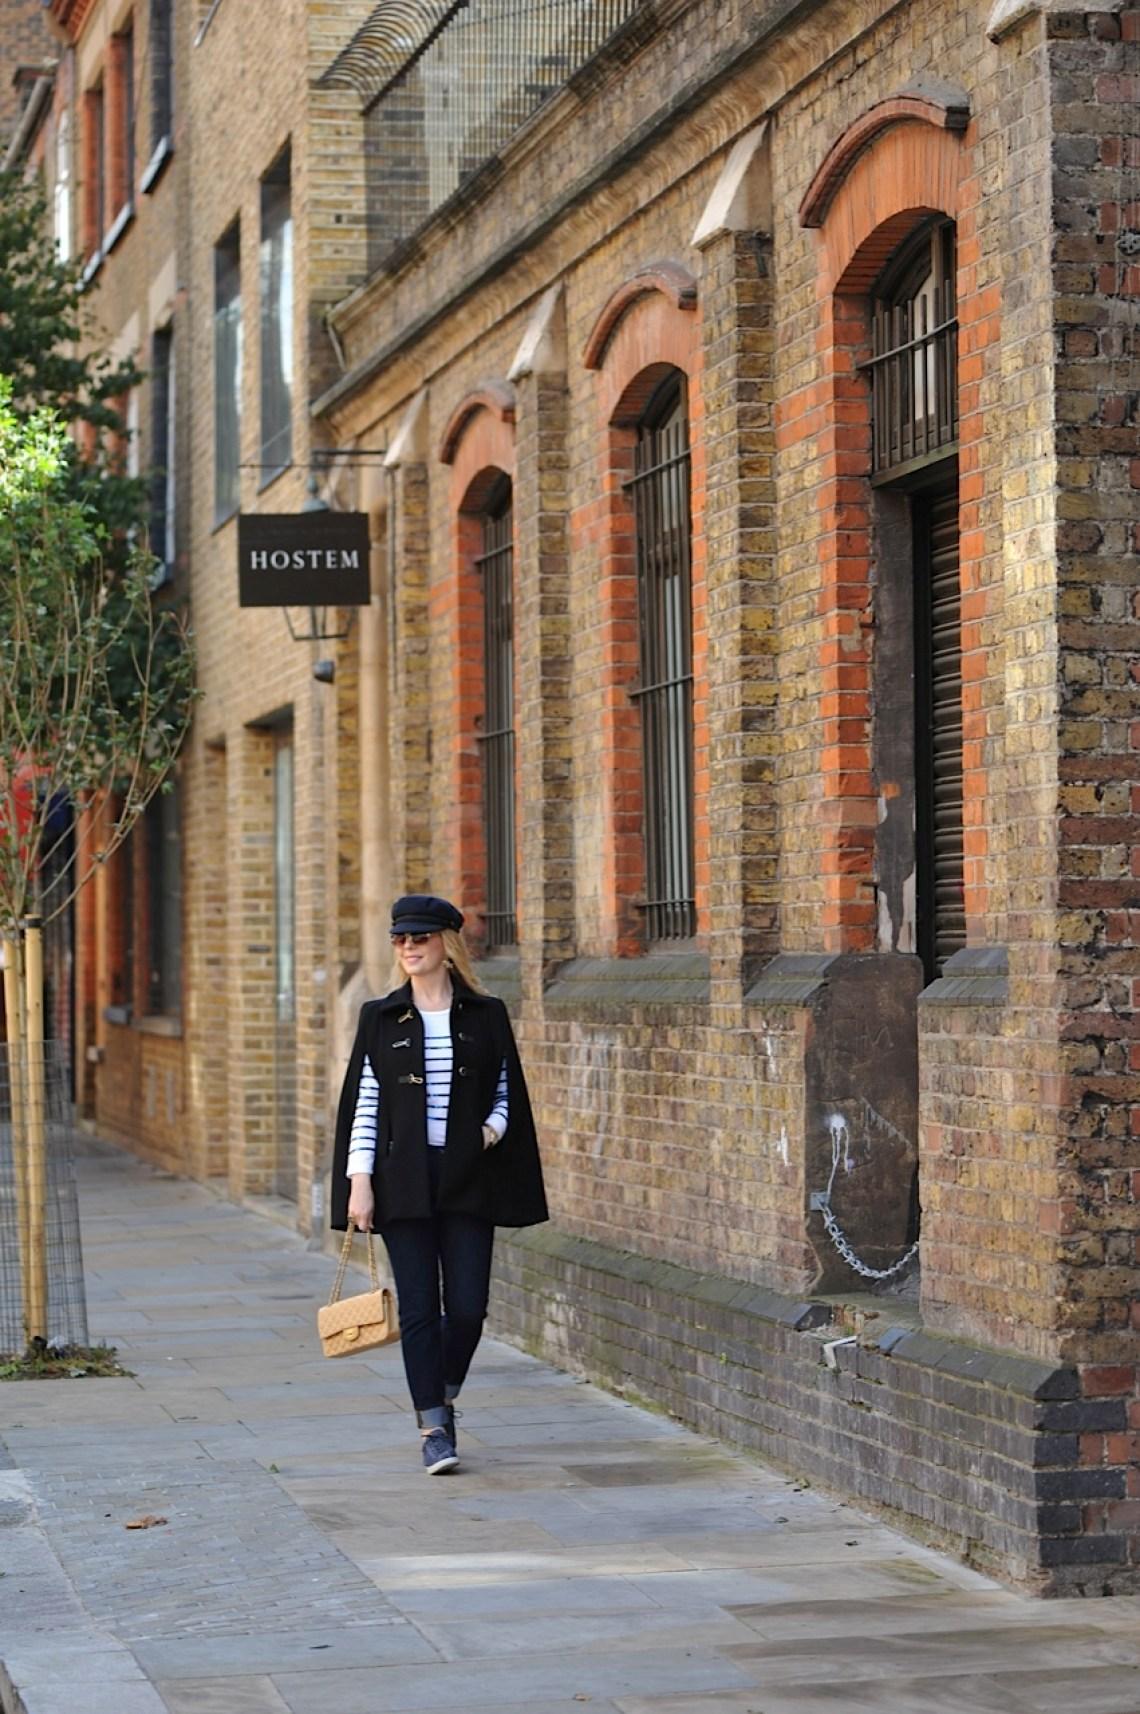 Ecco Sequinist street shot